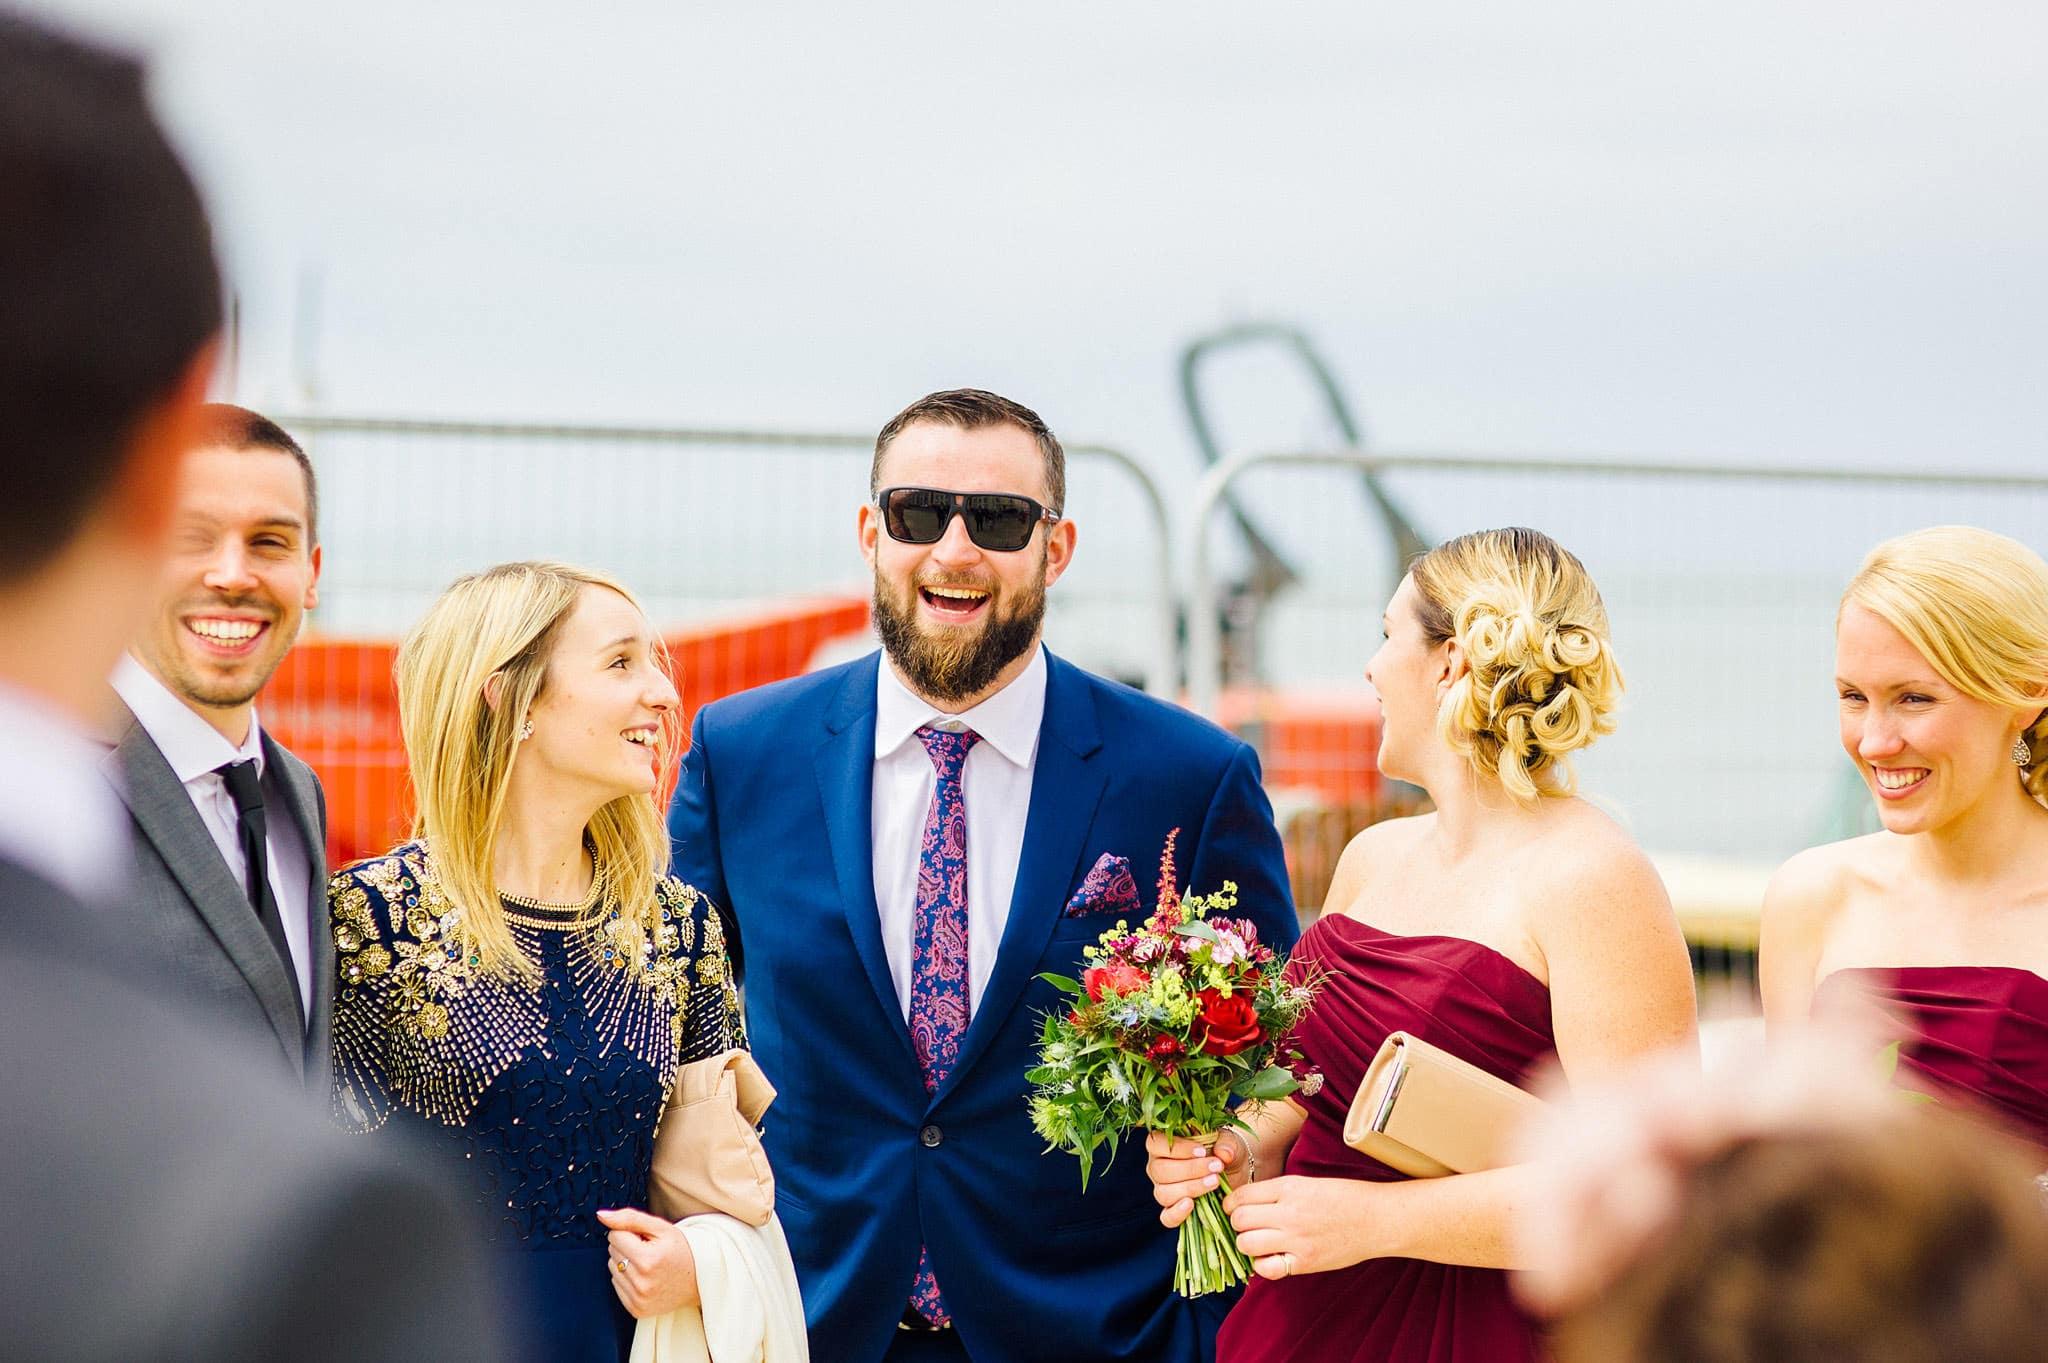 wedding-photographer-aberystwyth-wales (98)